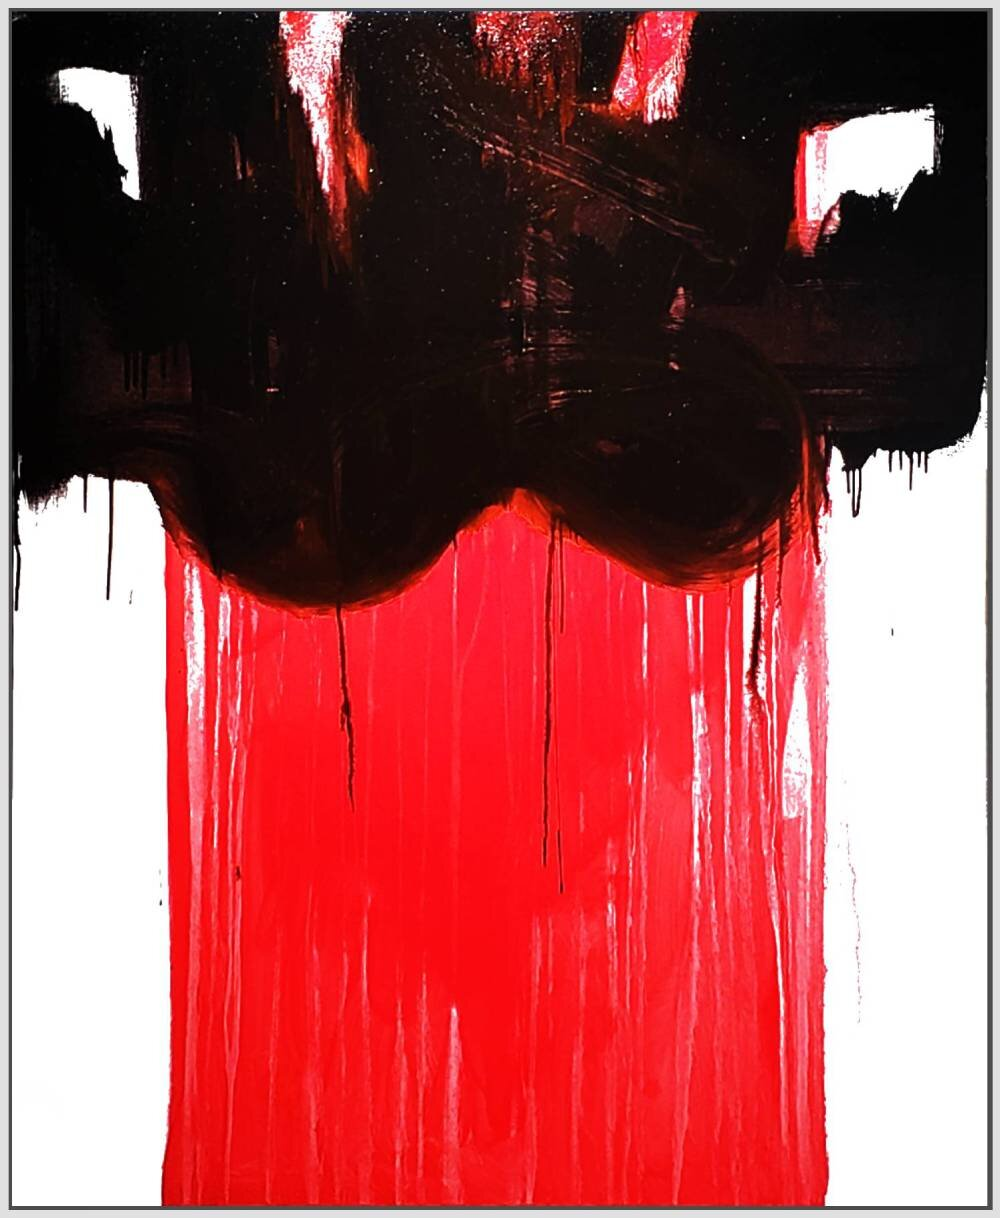 "Untitled #16, 2019, acrylic on canvas, 72"" x 48"" ( 183 x 122cm )"